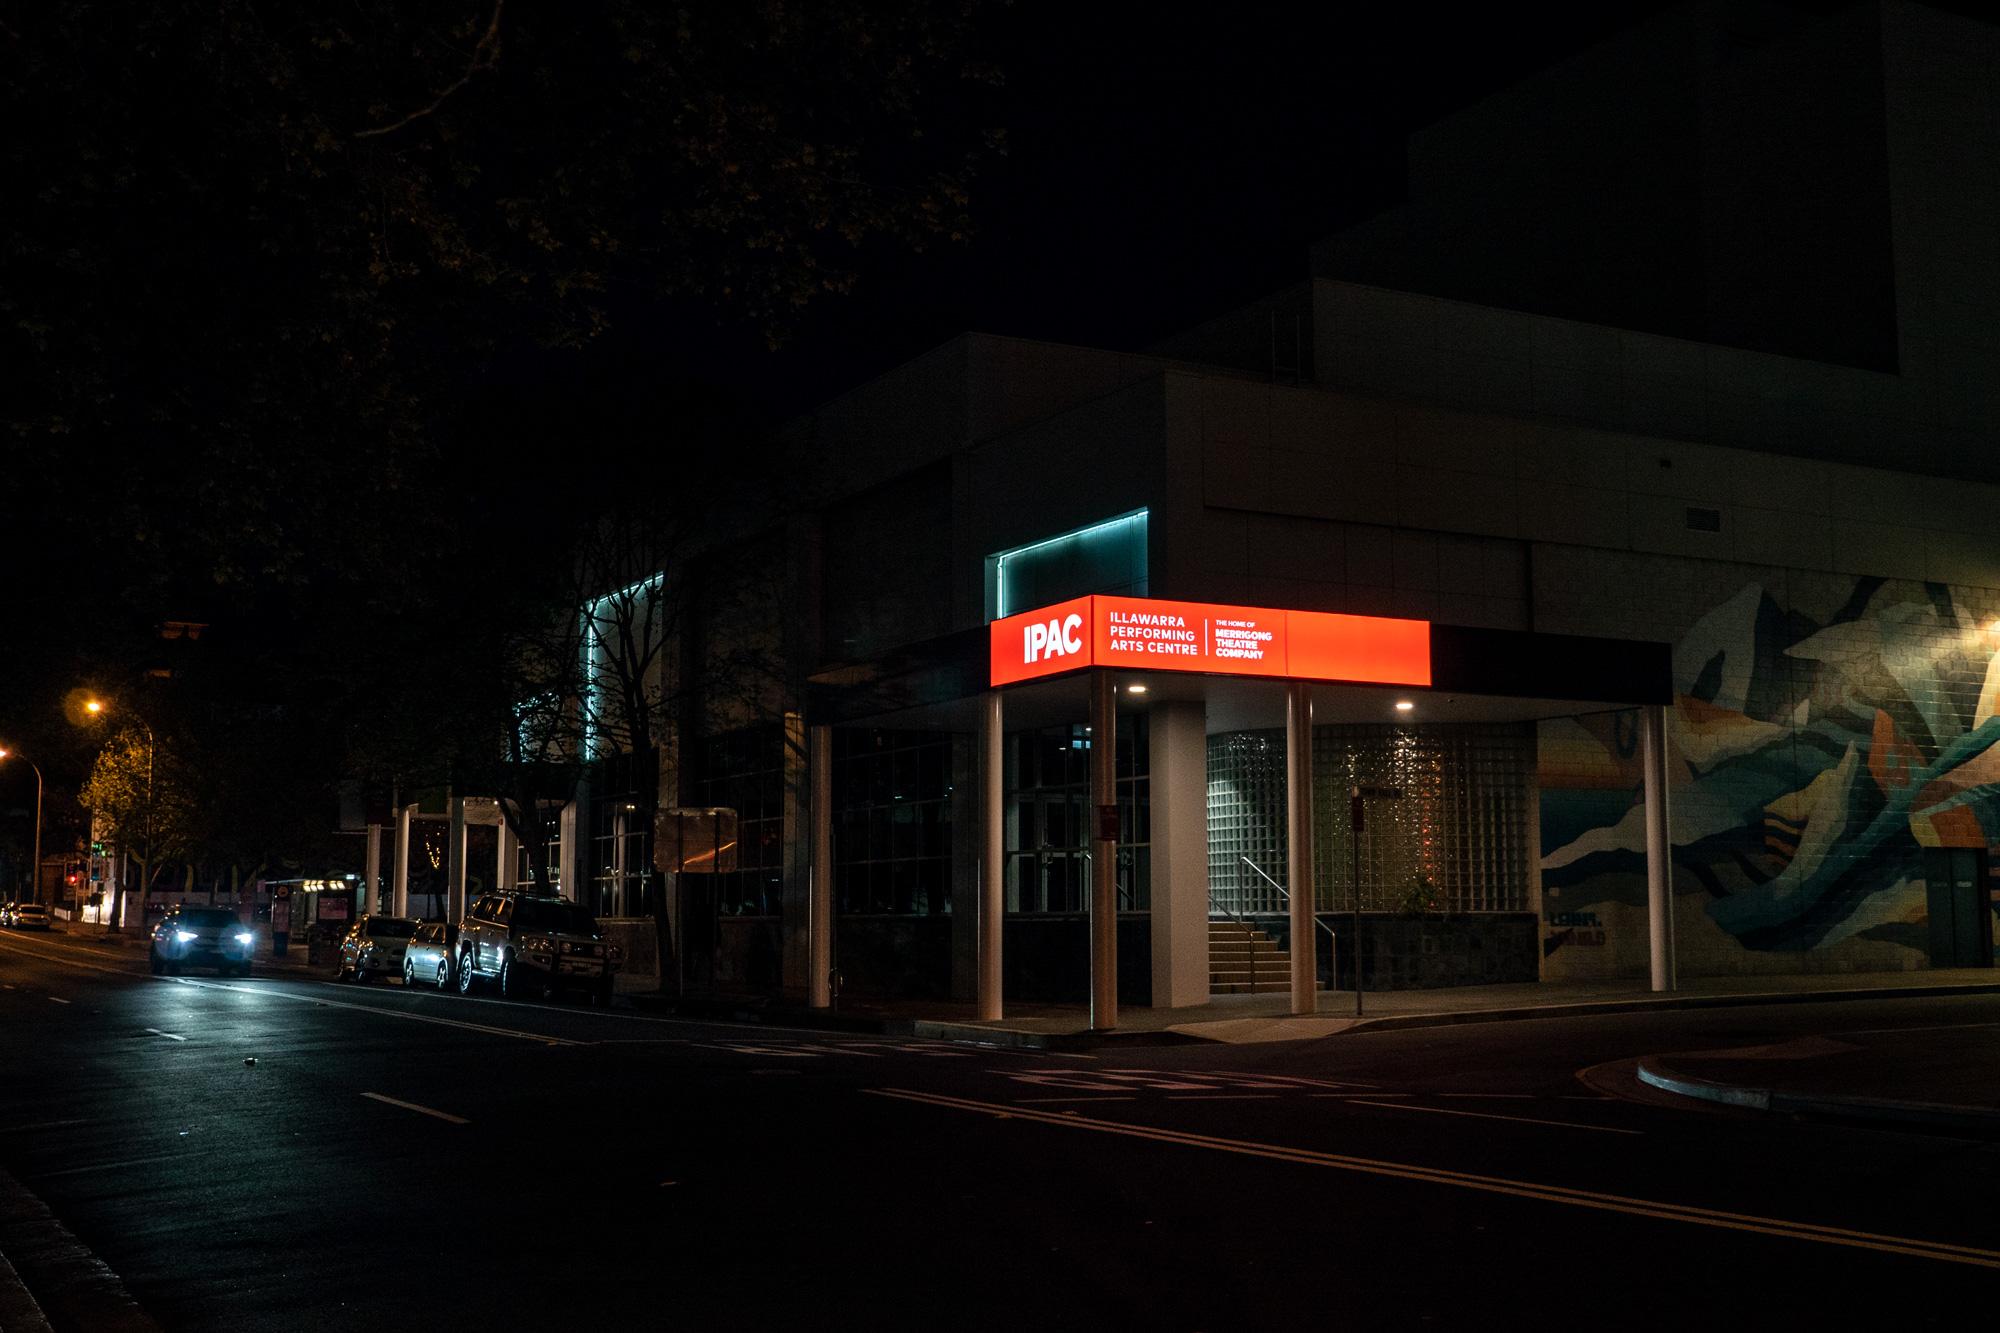 Illawarra Performing Arts Centre (IPAC) - Illuminated Awning Signage